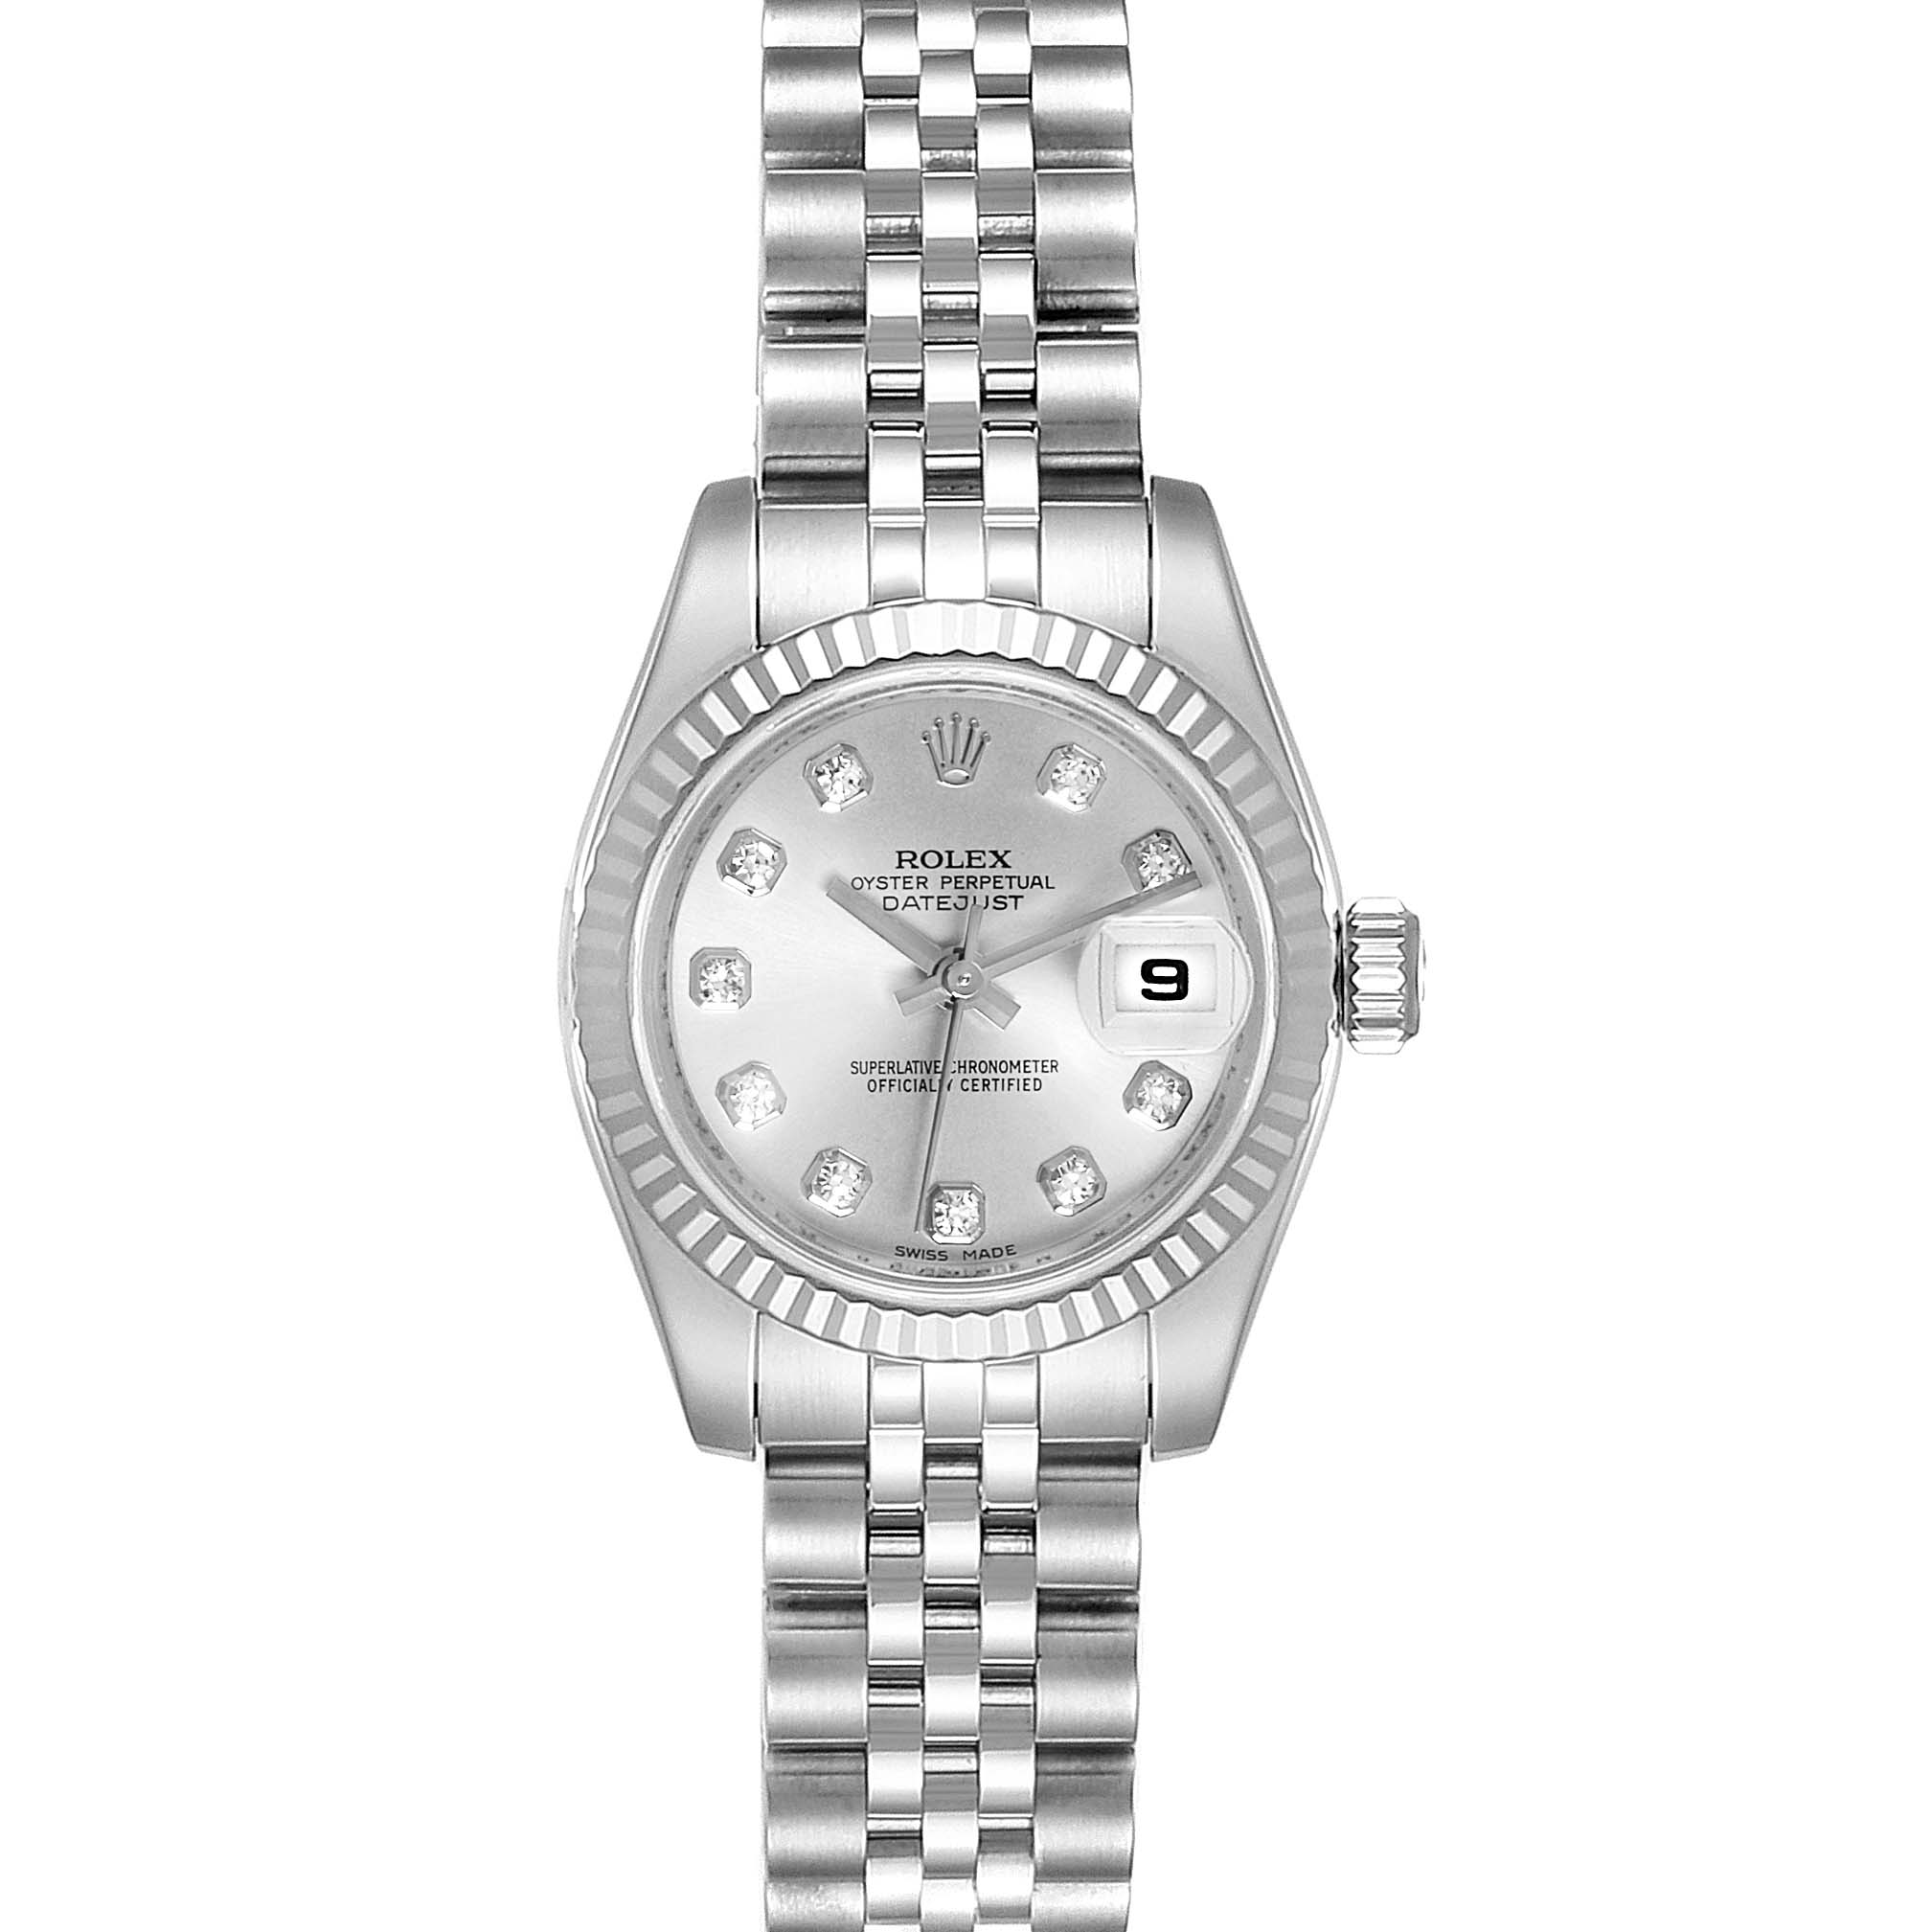 Rolex Datejust Steel White Gold Silver Diamond Dial Ladies Watch 179174